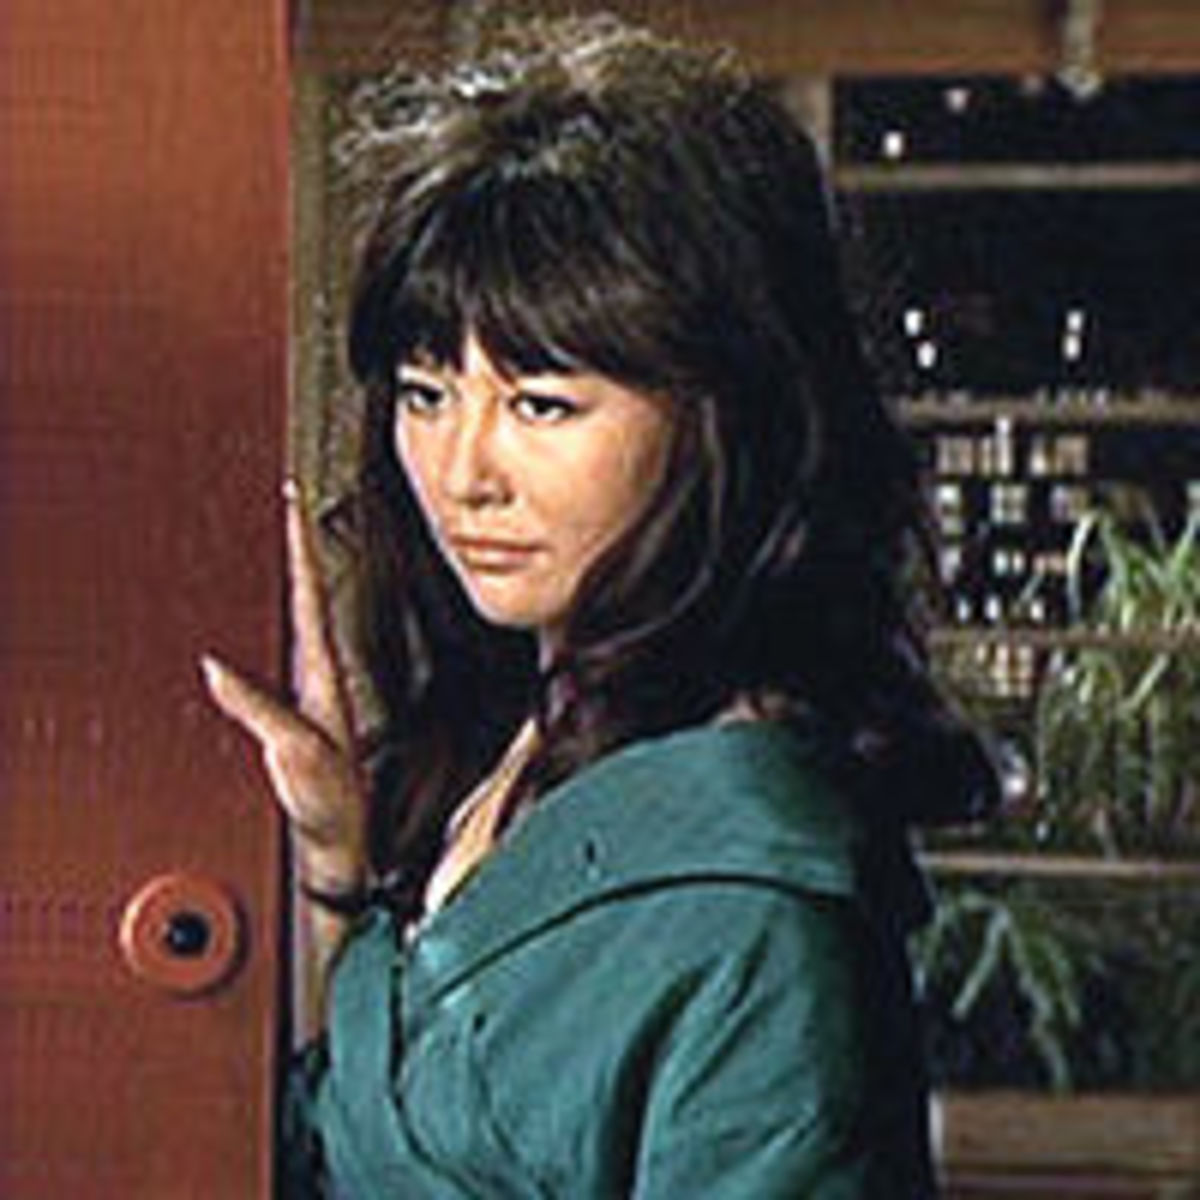 Tsai Chin as Ling